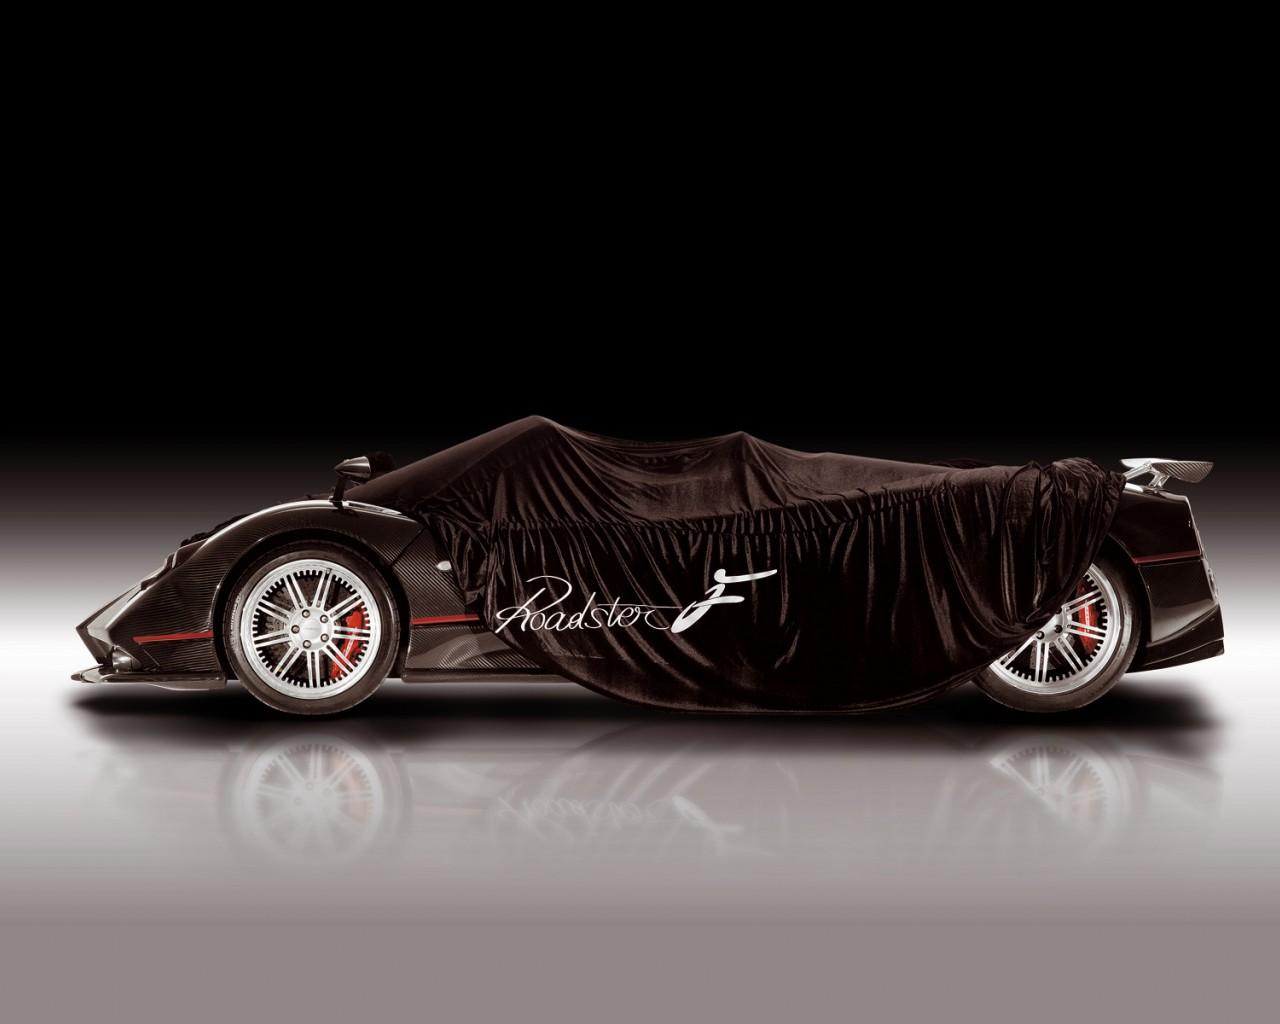 Pagani Zonda Roadster F photos and wallpapers - tuningnews.net